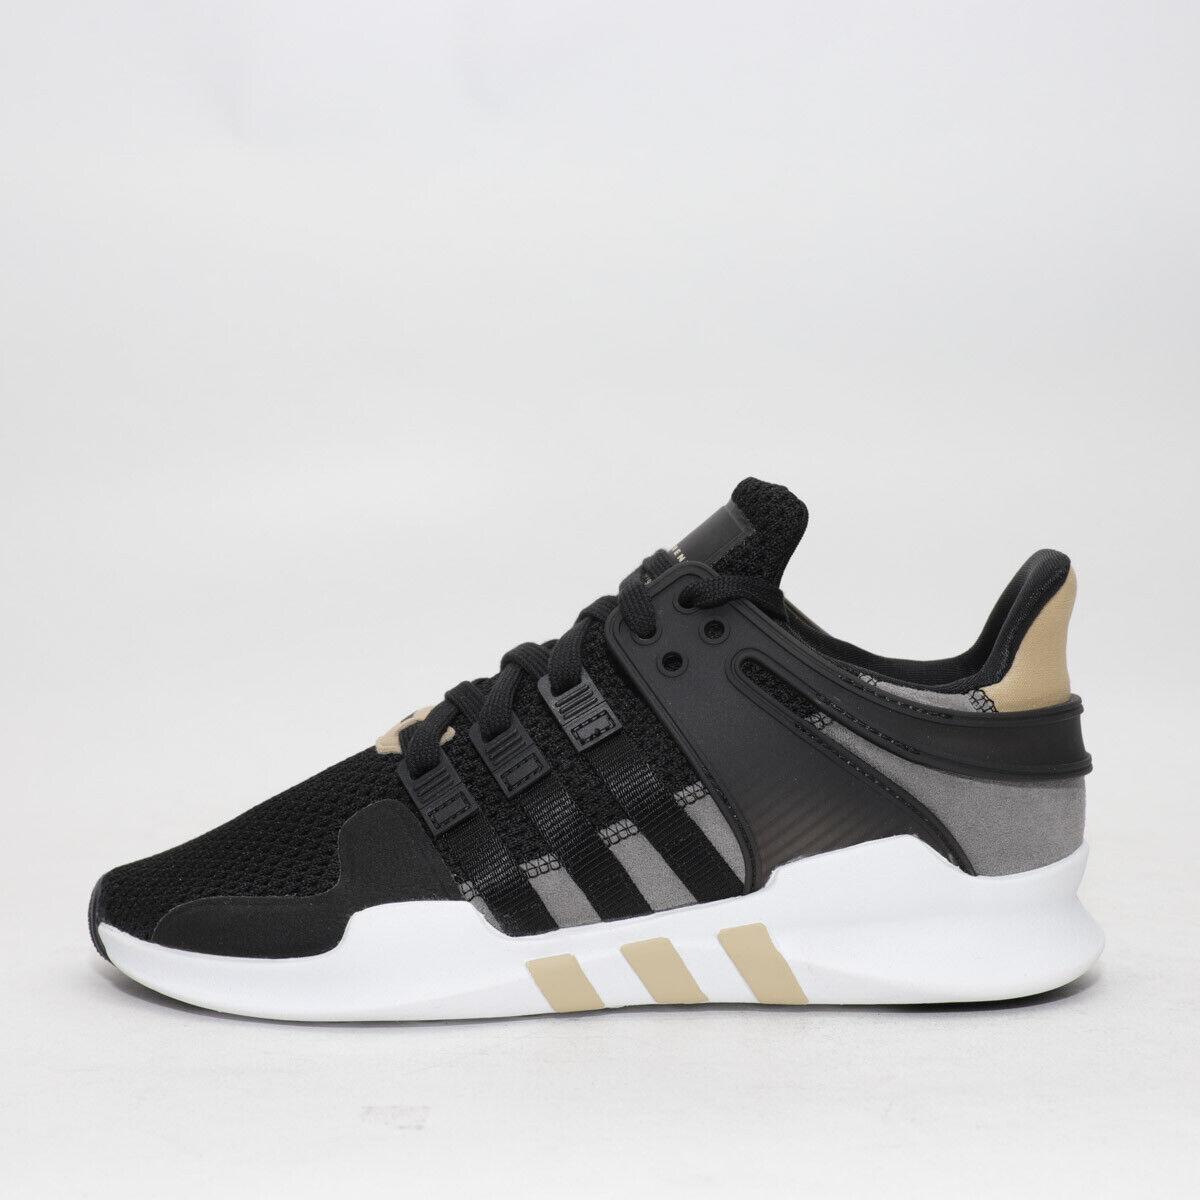 Para Hombre Adidas EQT Support ADV Negro blancooo Dorado Trainers (TGF26) RRP